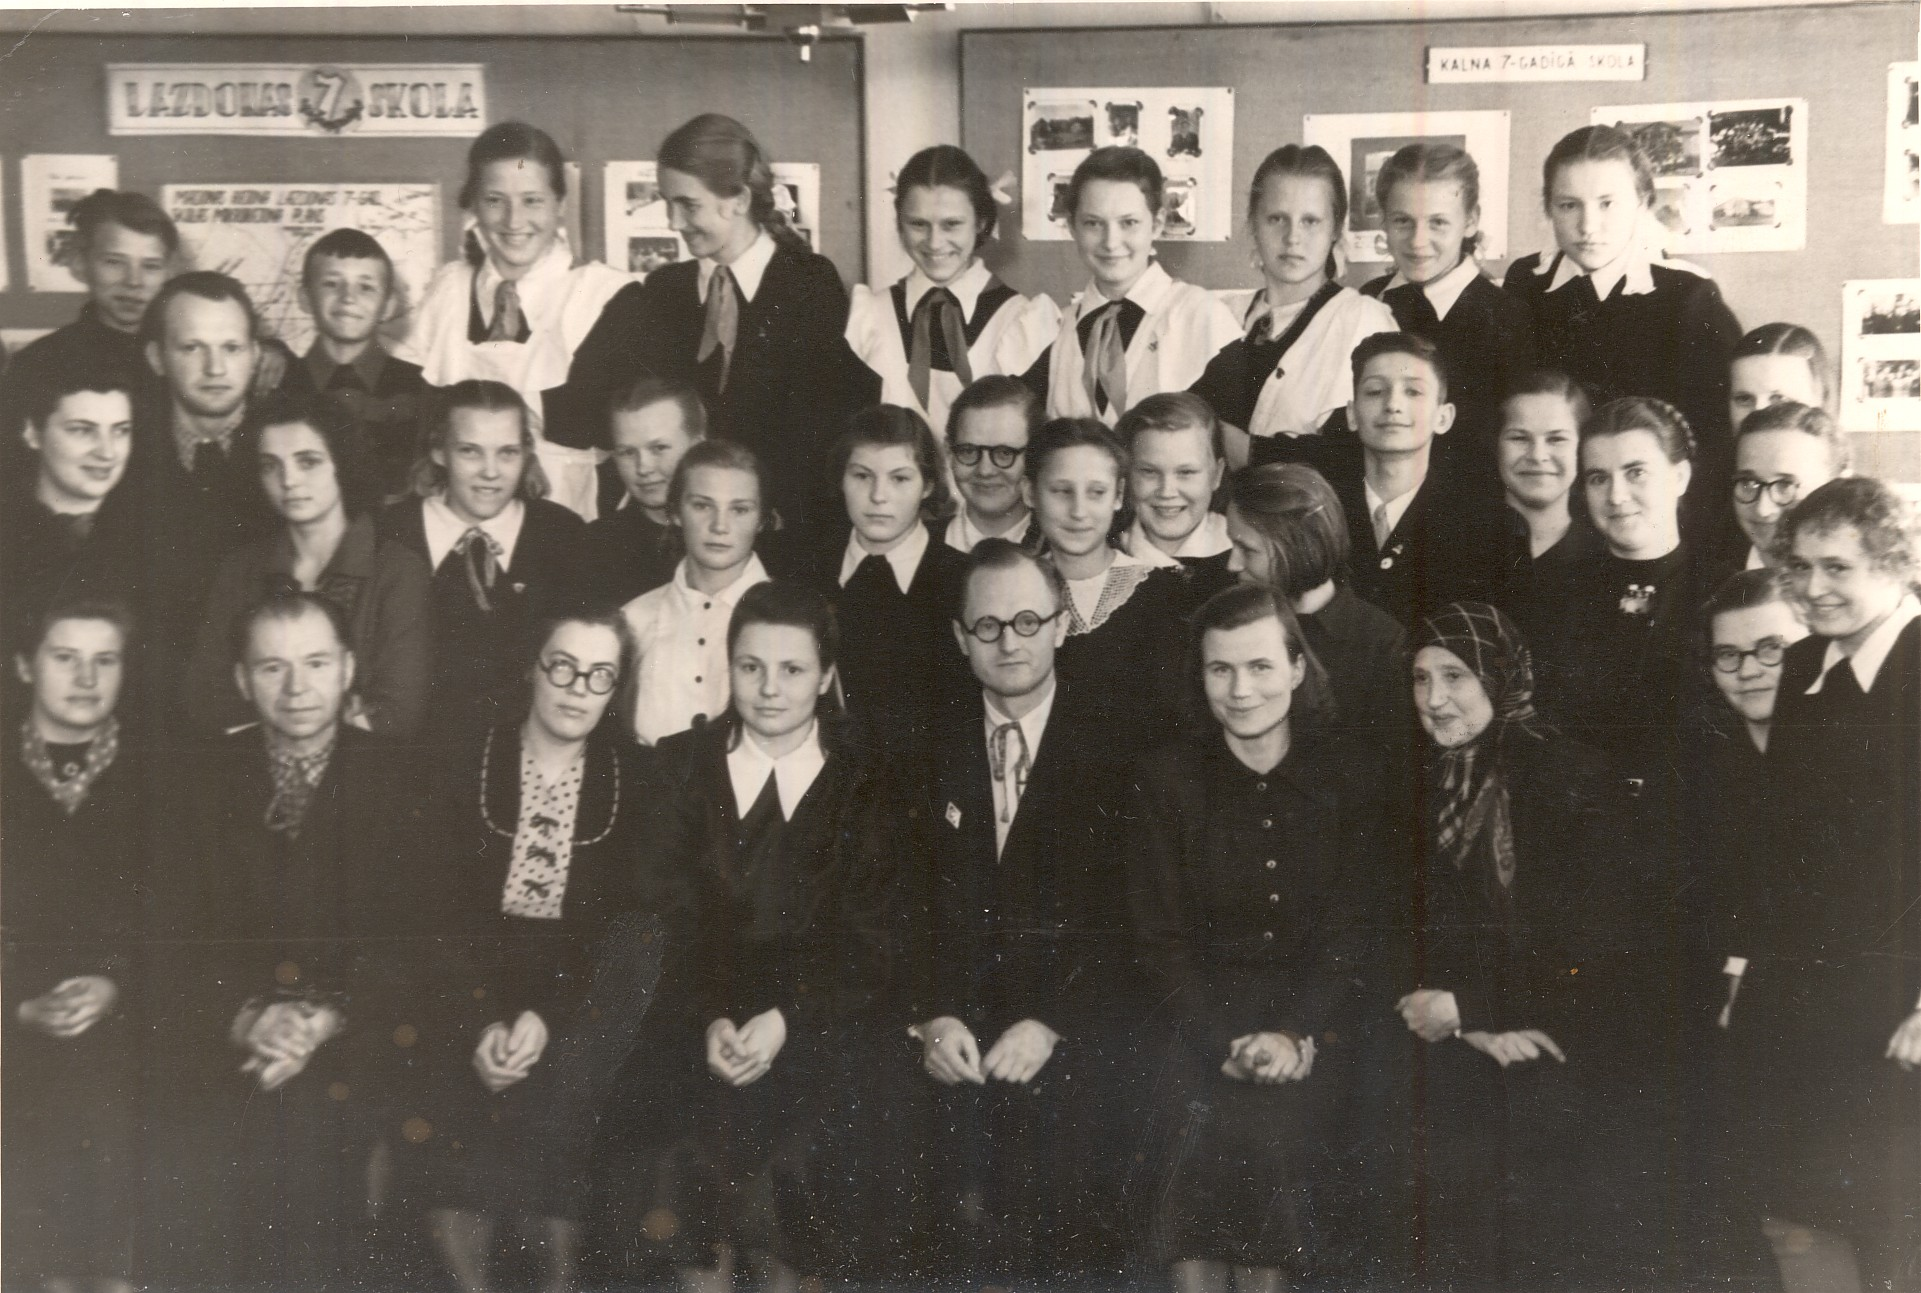 Vladislavs Urtāns in 1950s in Madona with schoolchildren and teachers interested in local history, file no. MNMZarh.535-1.